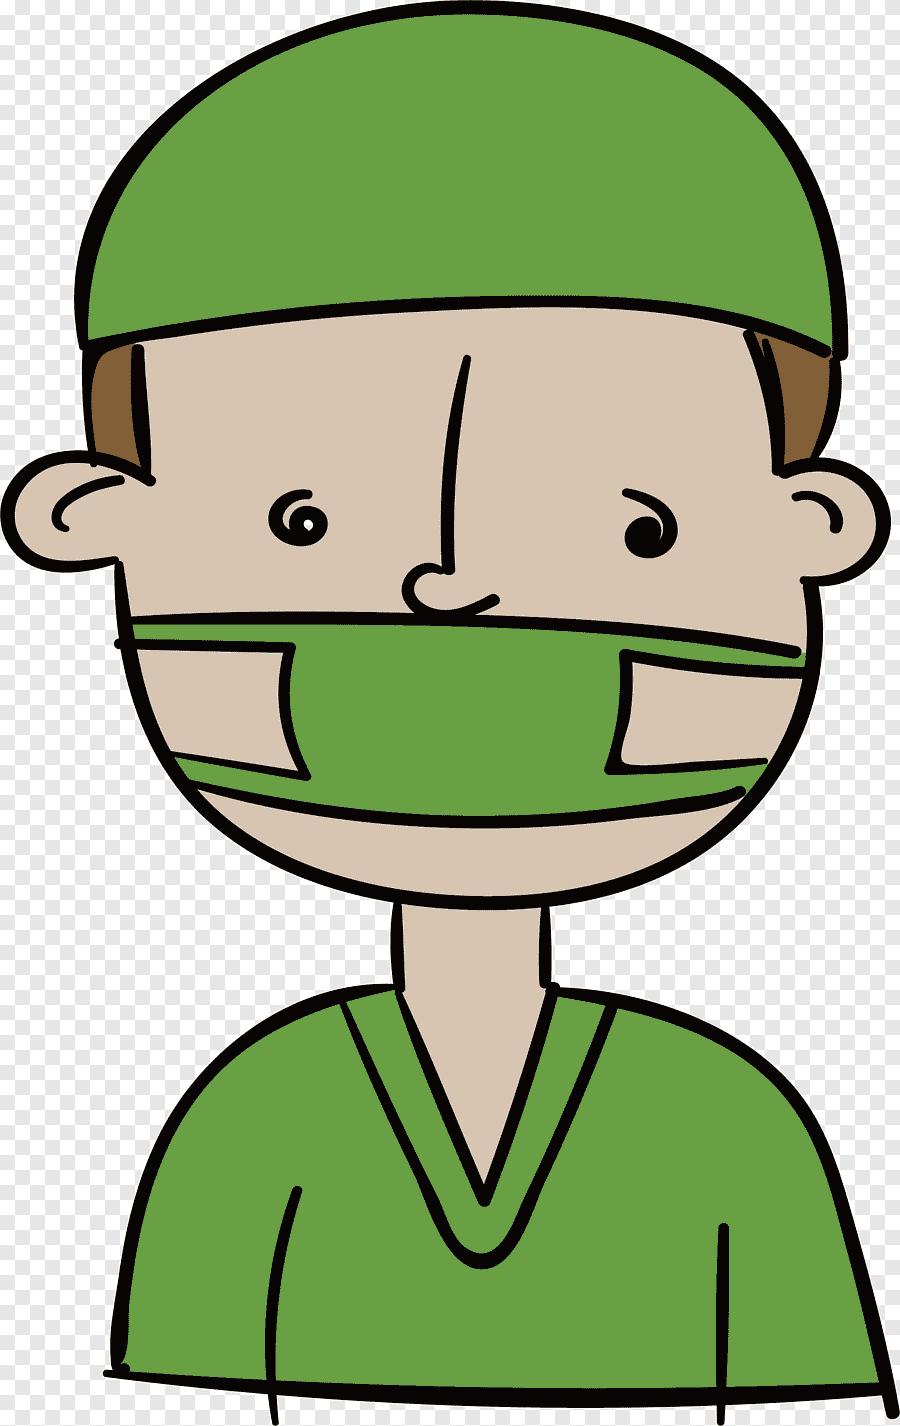 Gambar Animasi Orang Pakai Masker Png : gambar, animasi, orang, pakai, masker, Doctor, Wears, Mask,, Hand,, People, PNGEgg